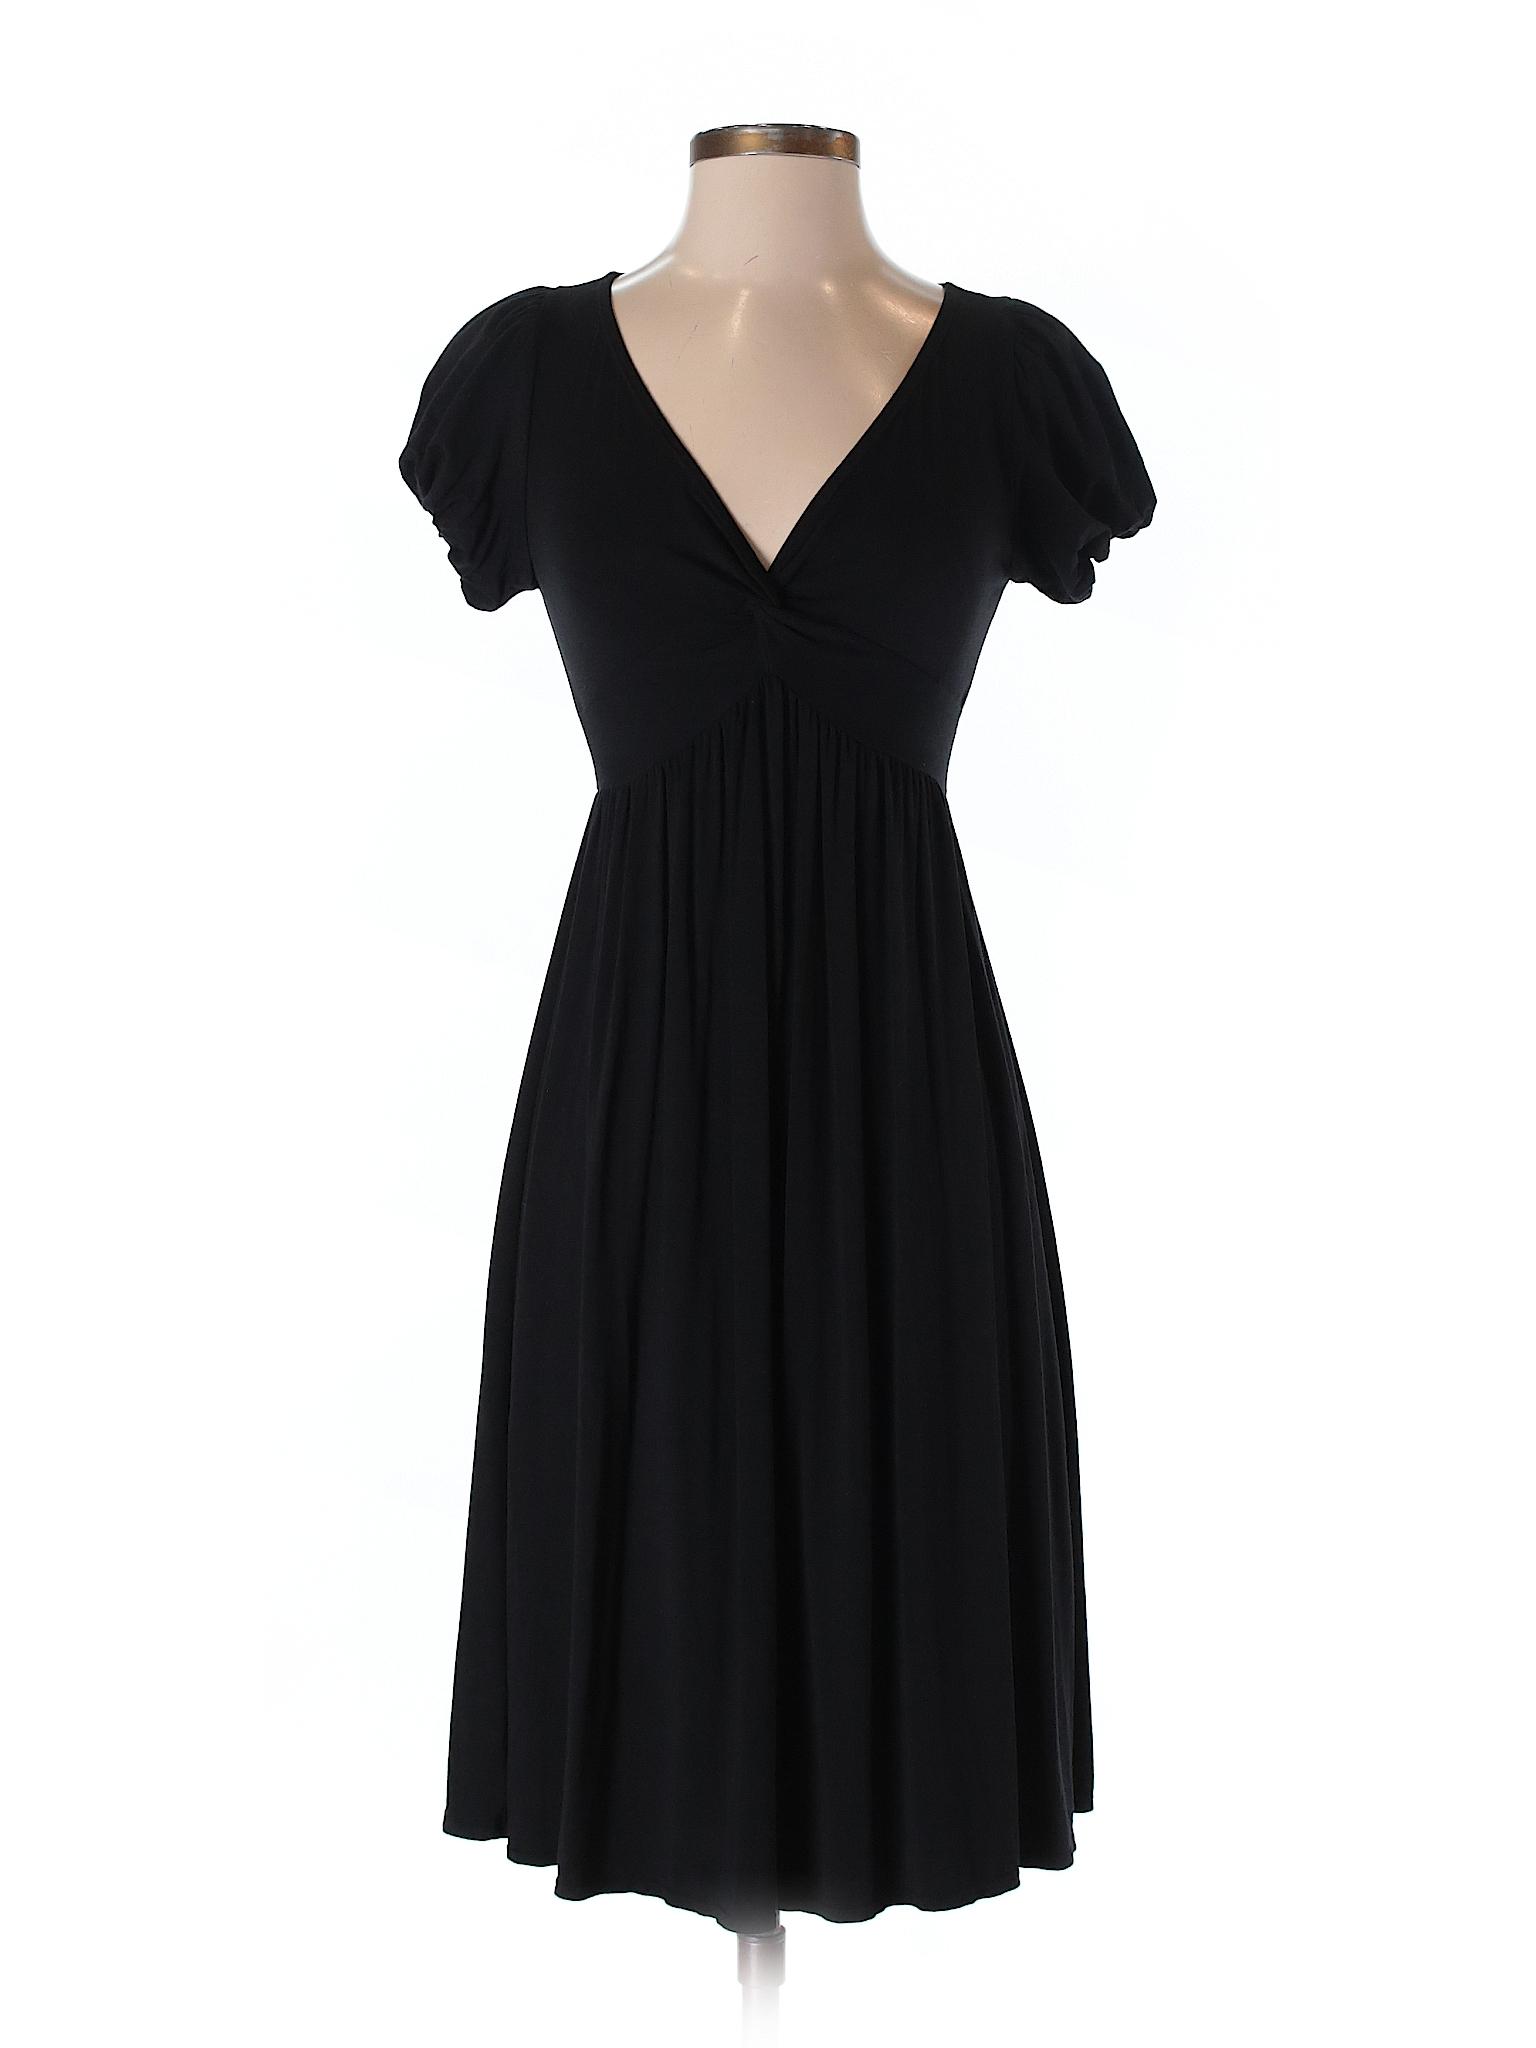 Boutique Studio Dress Casual Max winter qzwfS